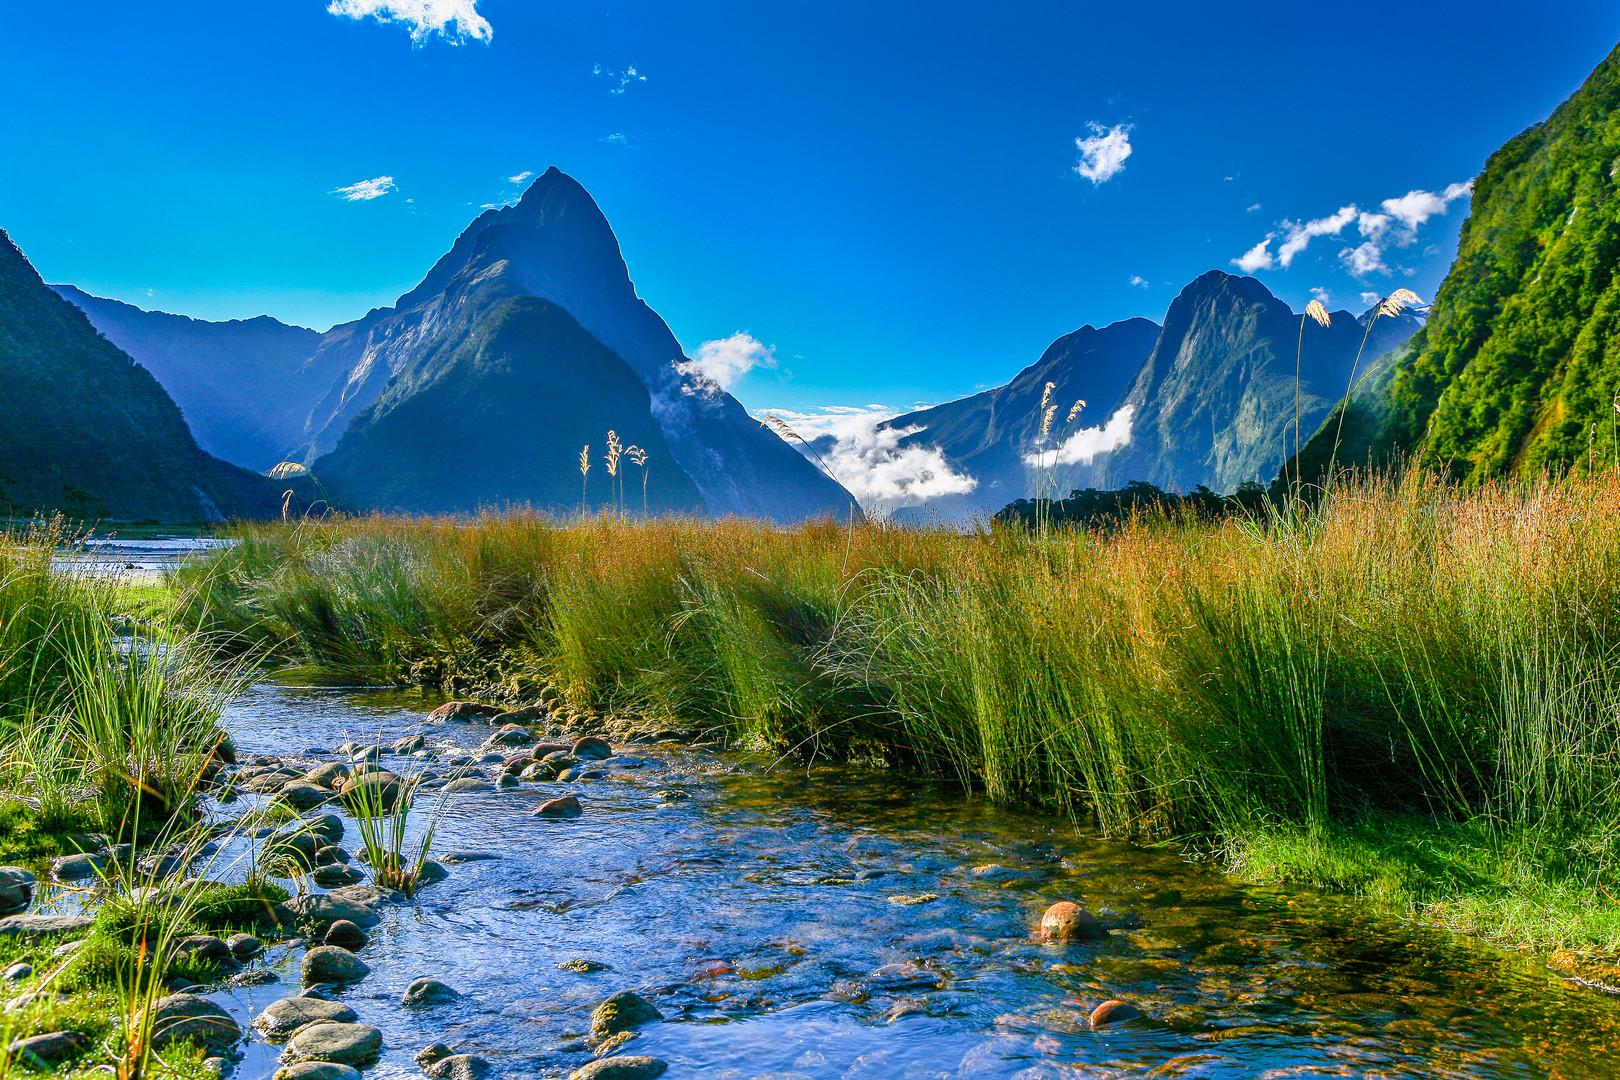 Video Neuseeland Twitter: Milford Sound Neuseeland Foto & Bild